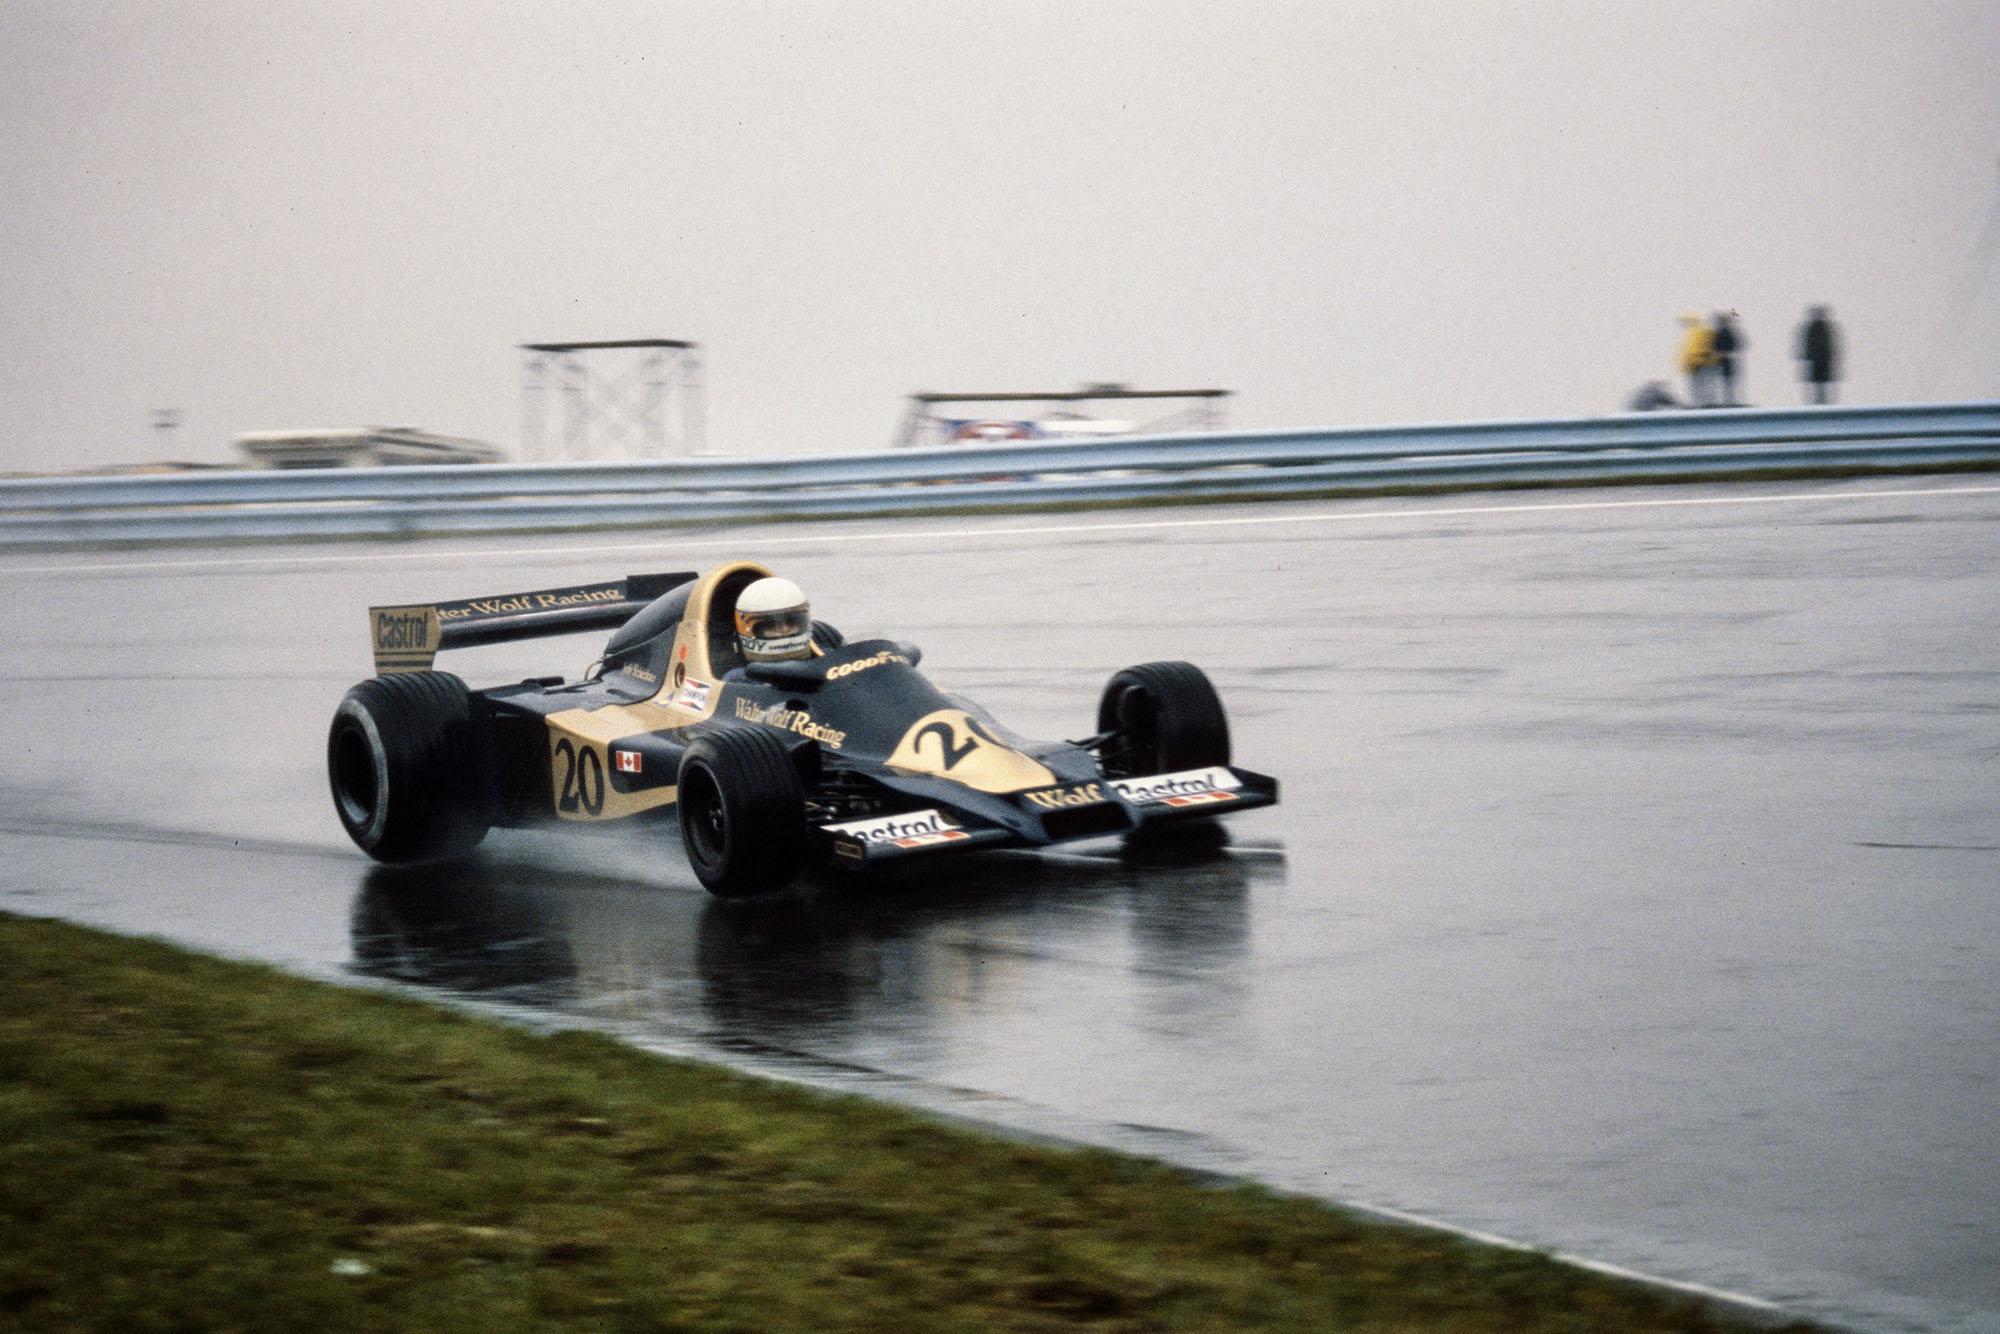 Jody Scheckter (Wolf) driving at the 1977 United States Grand Prix East, Watkins Glen.